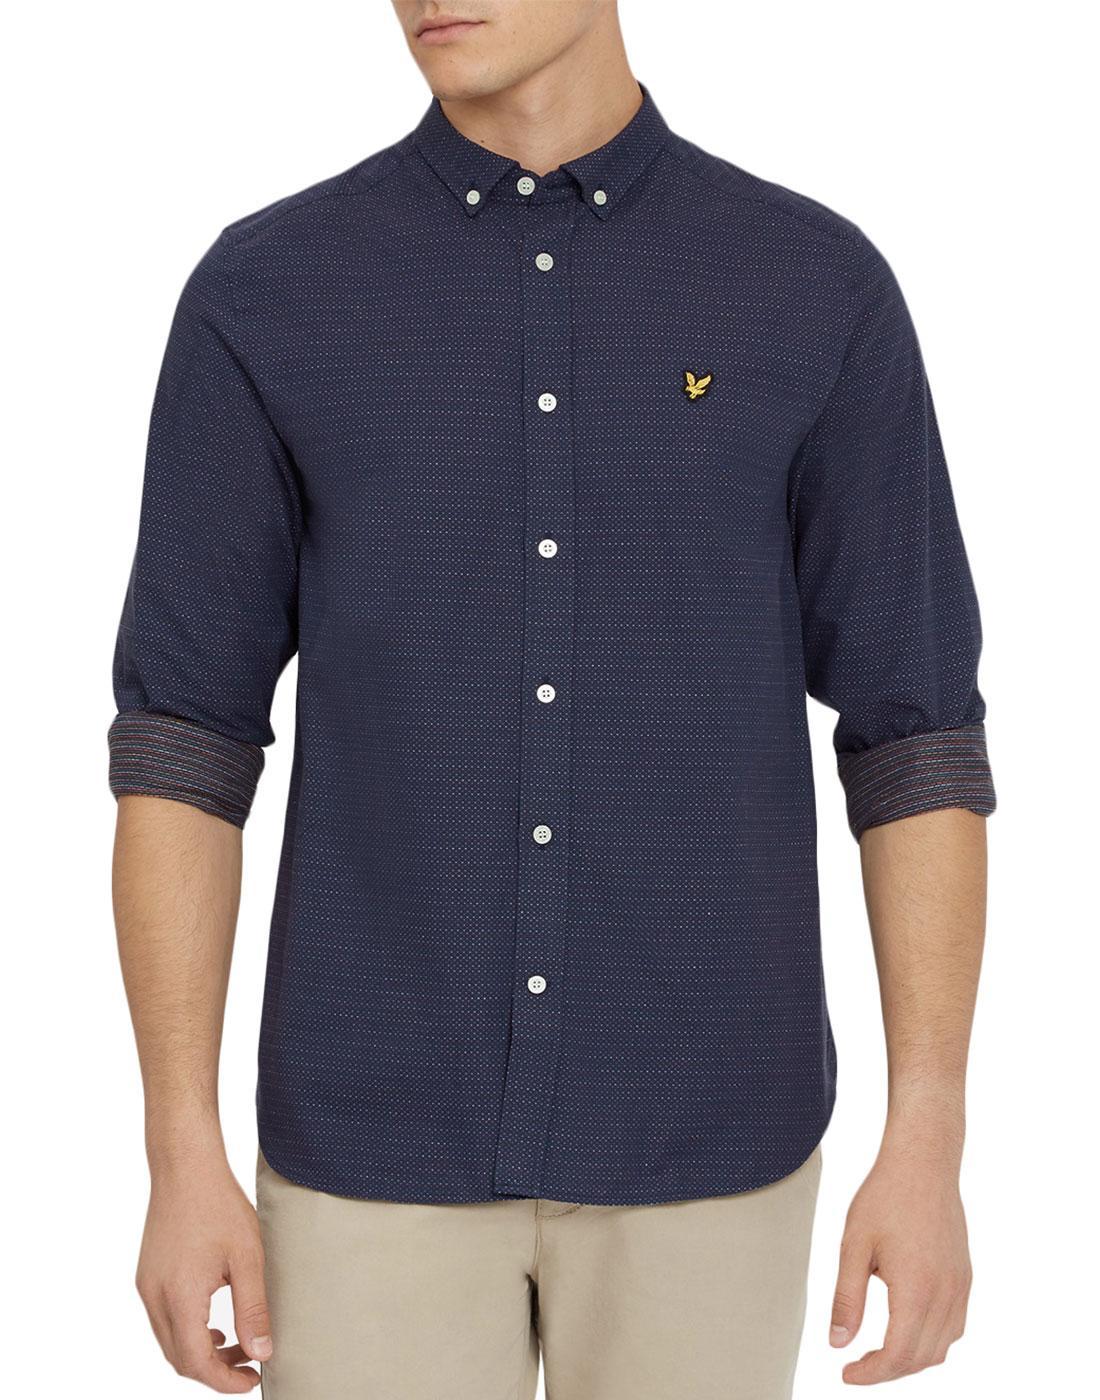 LYLE & SCOTT Retro Jacquard Running Stitch Shirt